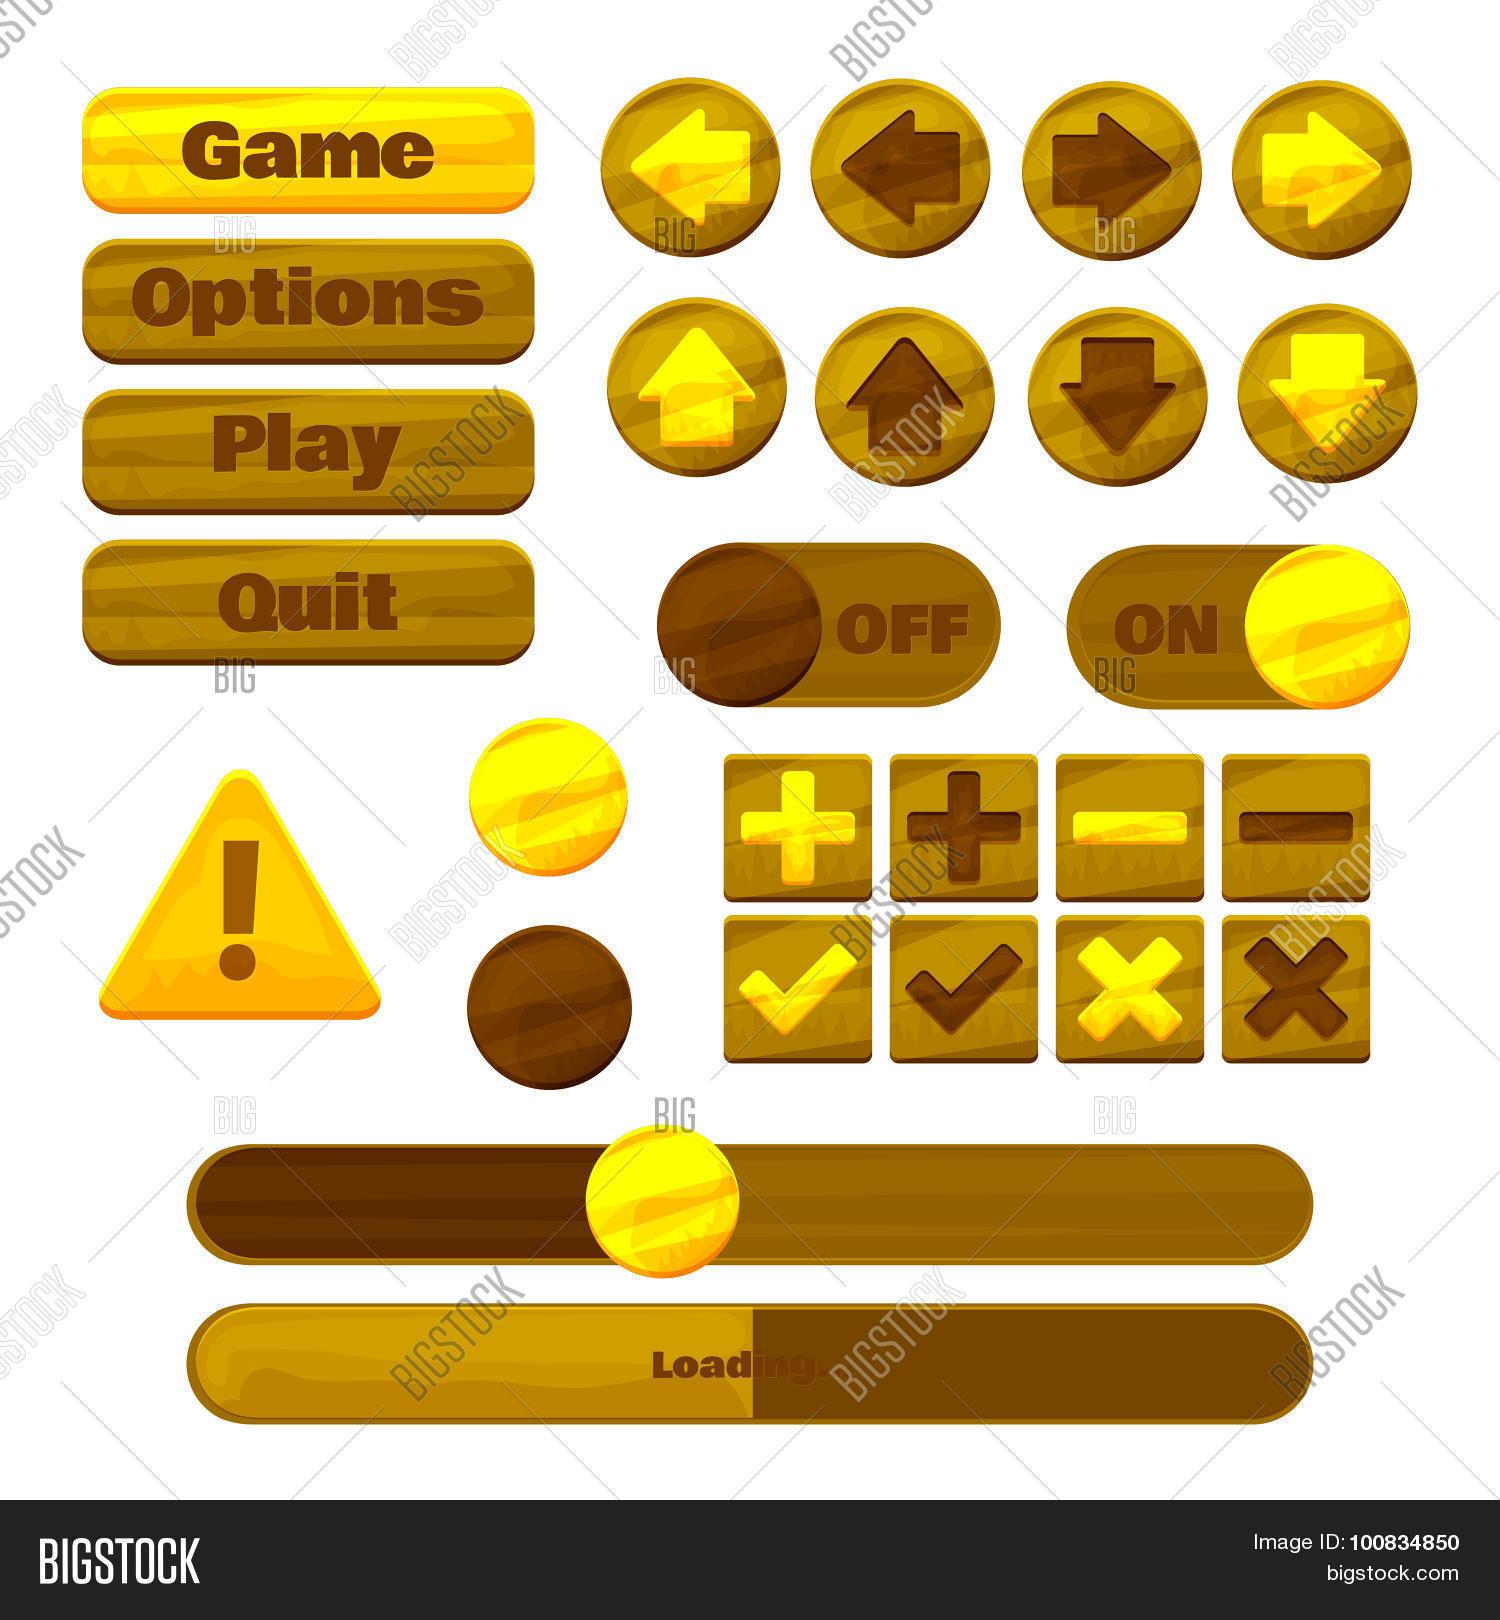 Universal Yellow UI Image & Photo (Free Trial) | Bigstock